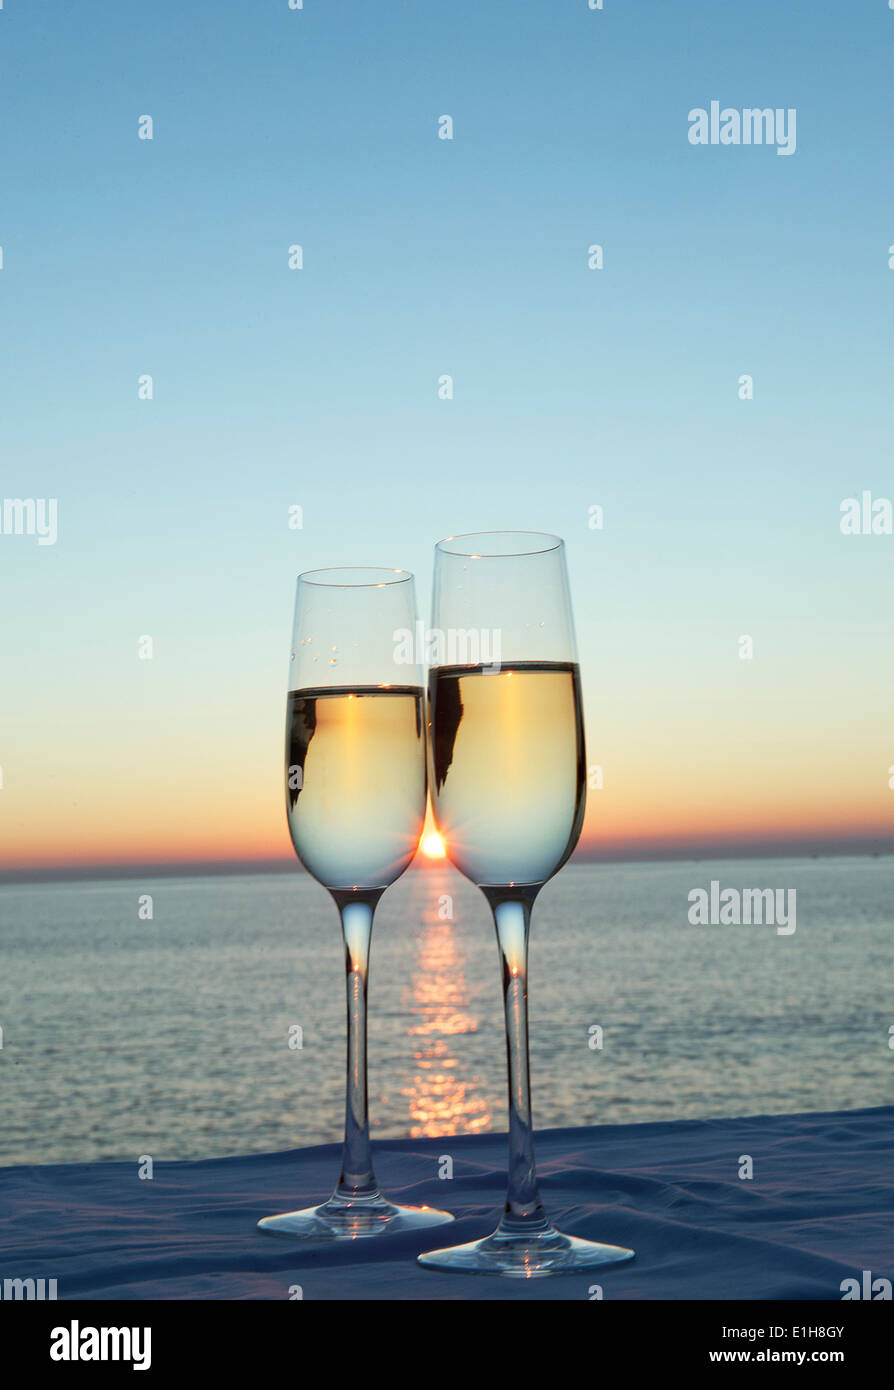 Zwei Sektgläser gegen Sonnenuntergang Stockfoto